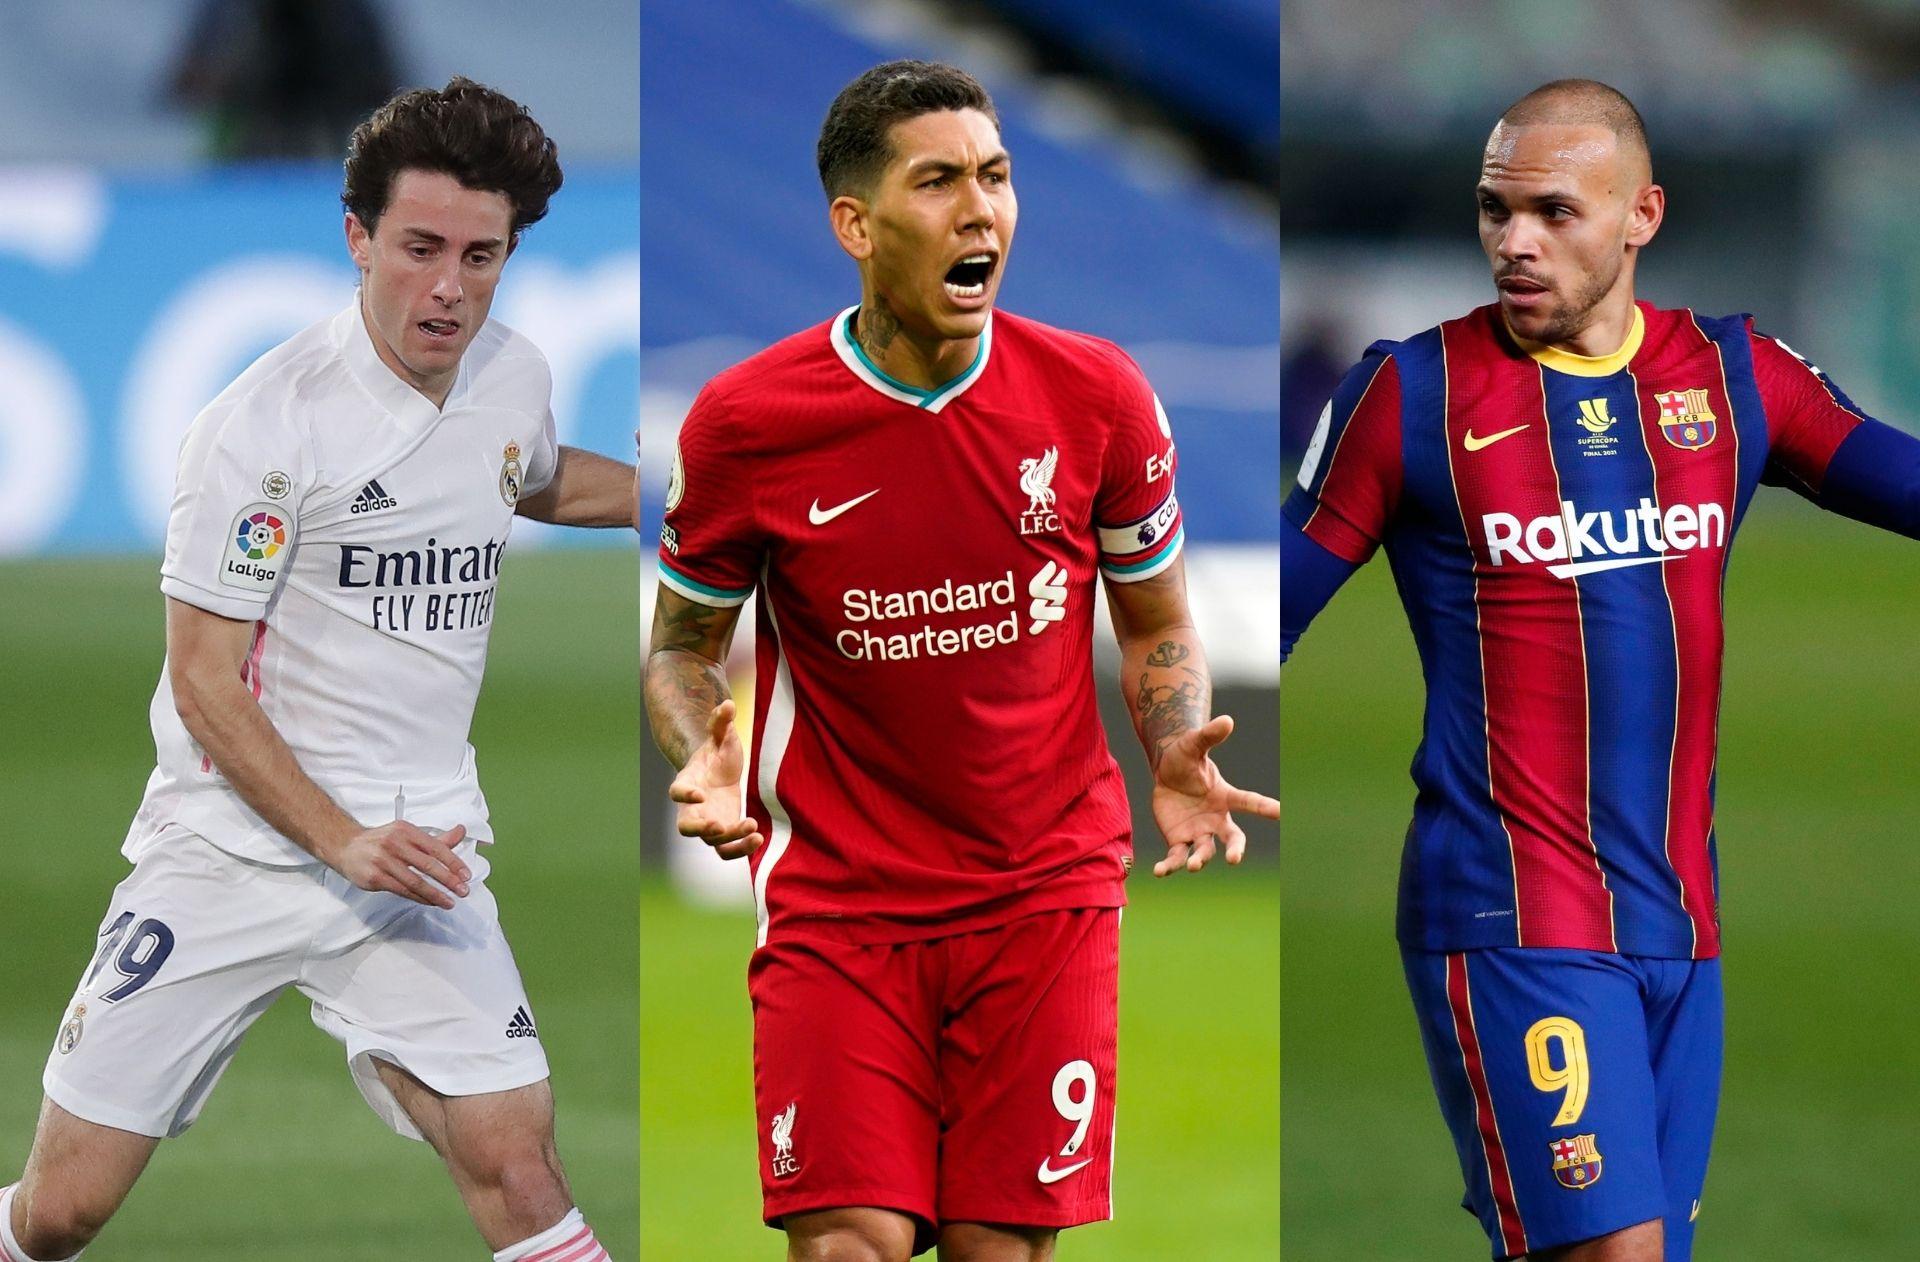 Alvaro Odriozola - Real Madrid, Roberto Firmino - Liverpool, Martin Braithwaite of FC Barcelona